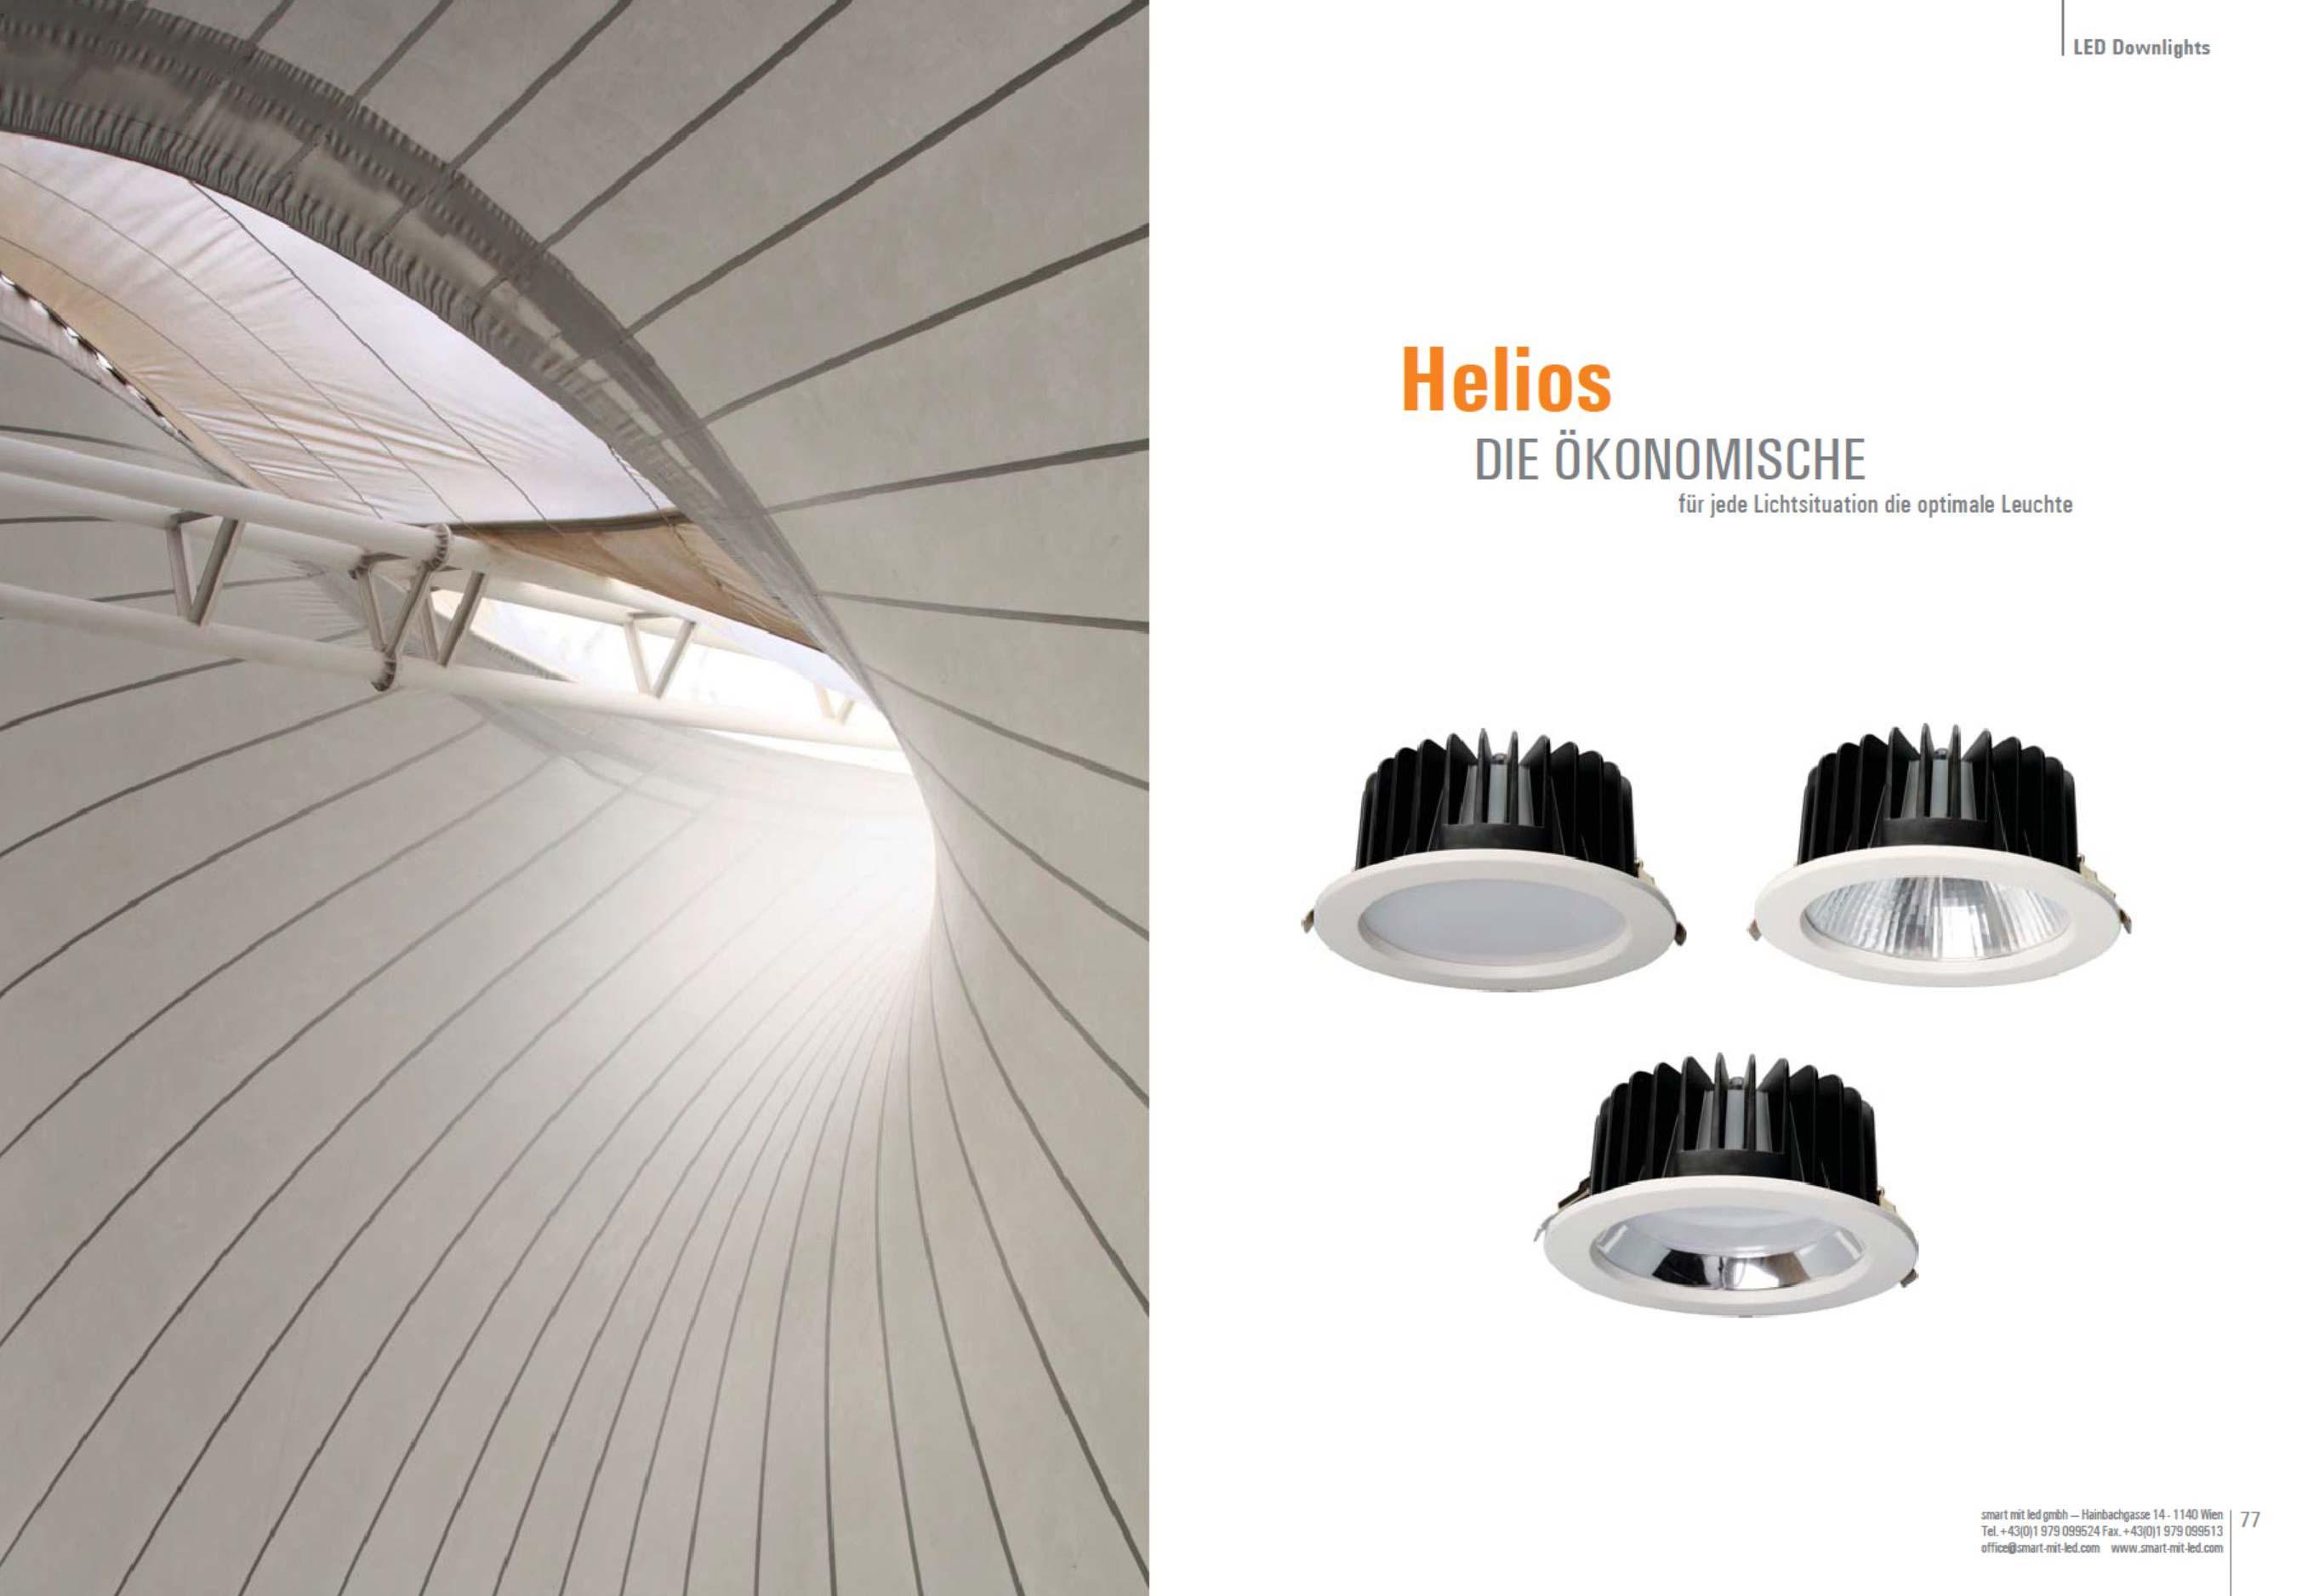 LED Downlight Helios